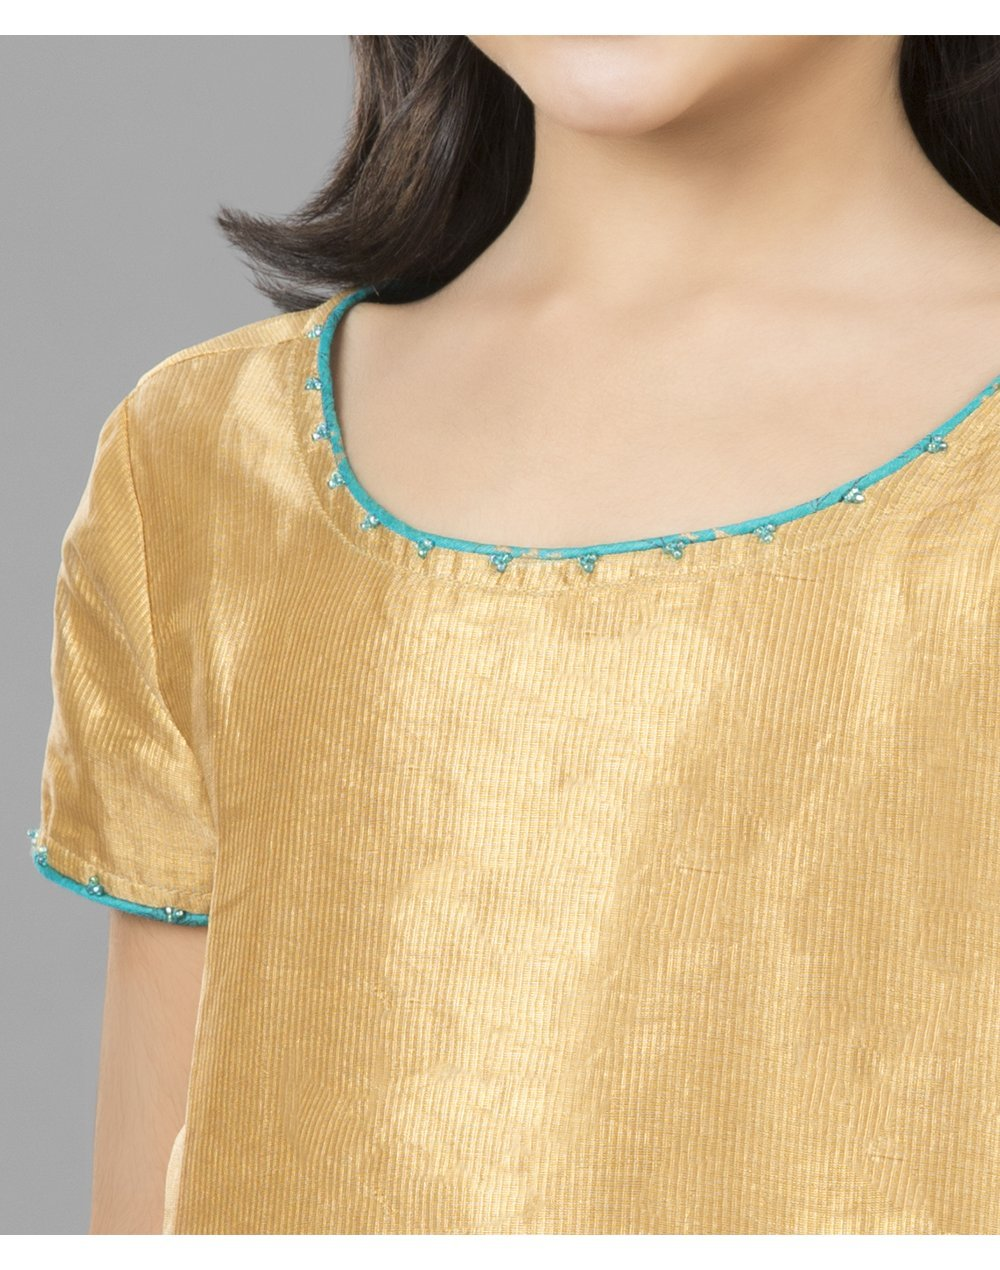 Fabindia Girls Silk Cotton Choli Back Tie Lehenga Set 6-8Yr